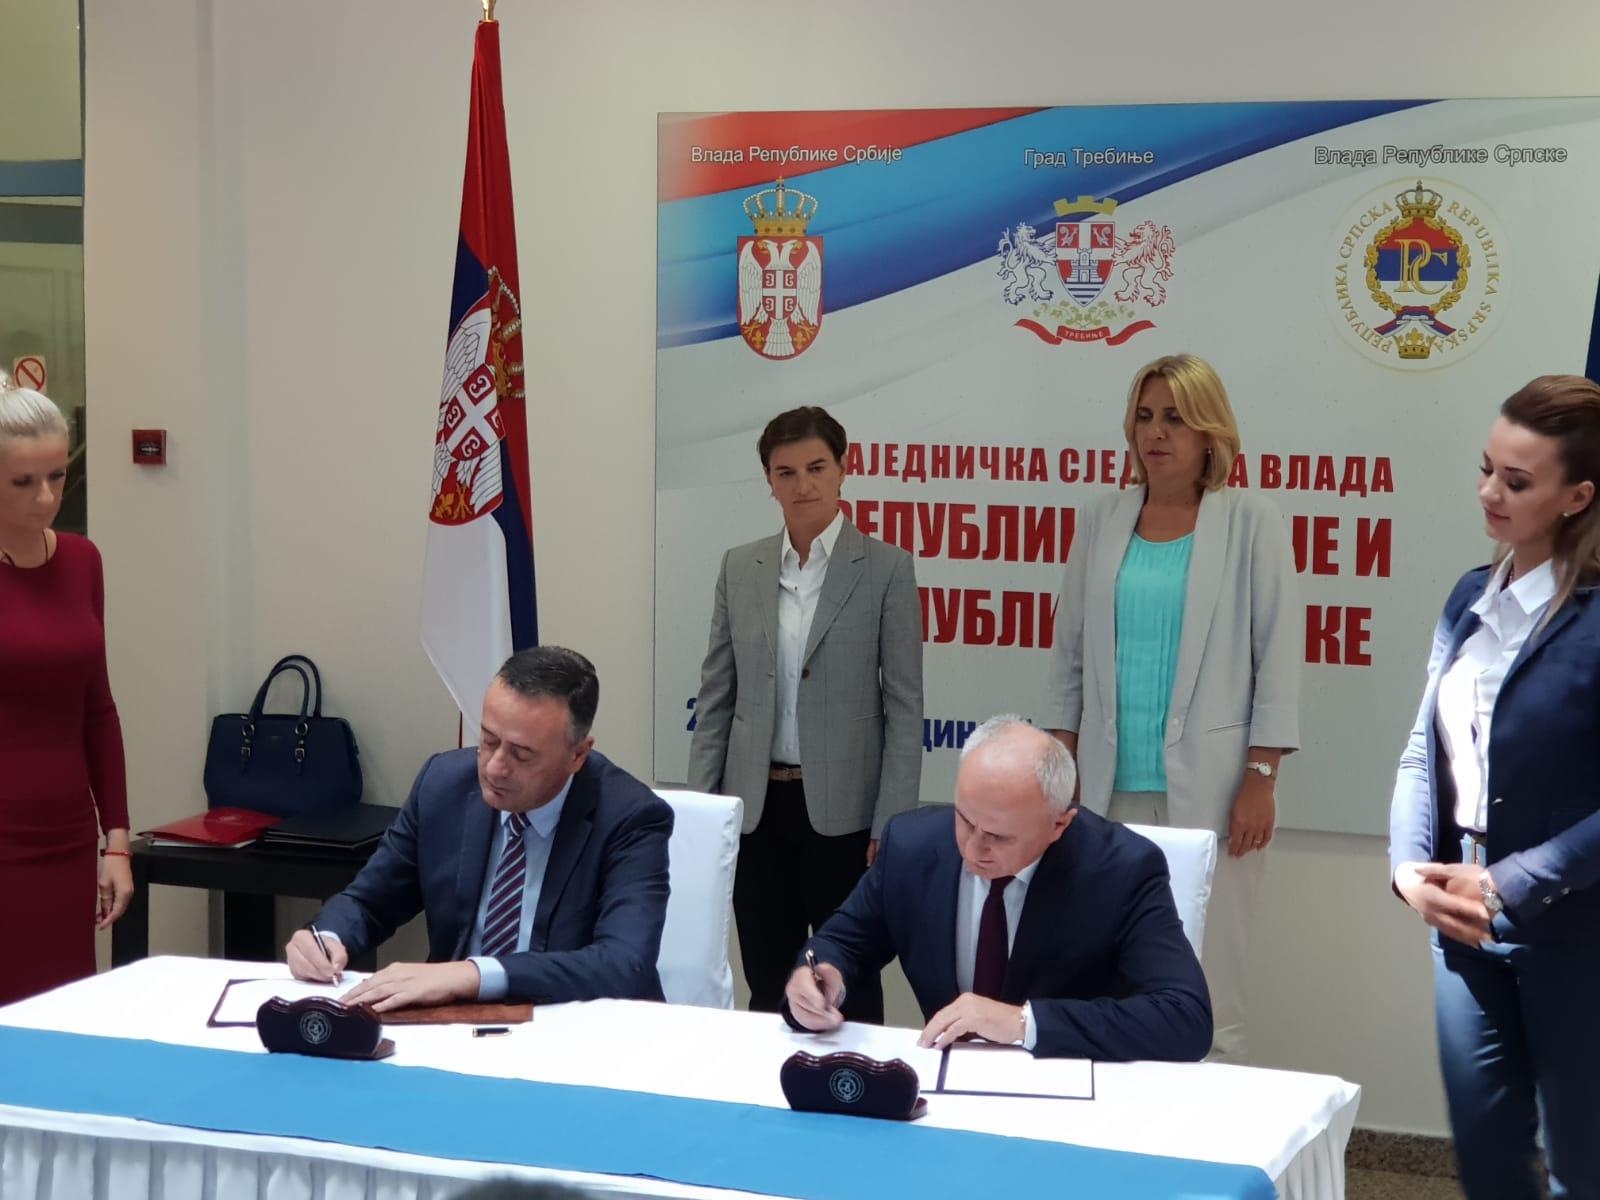 Republika Srbija i Republika Srpska - potpisan memorandum o saradnji u oblasti energetike